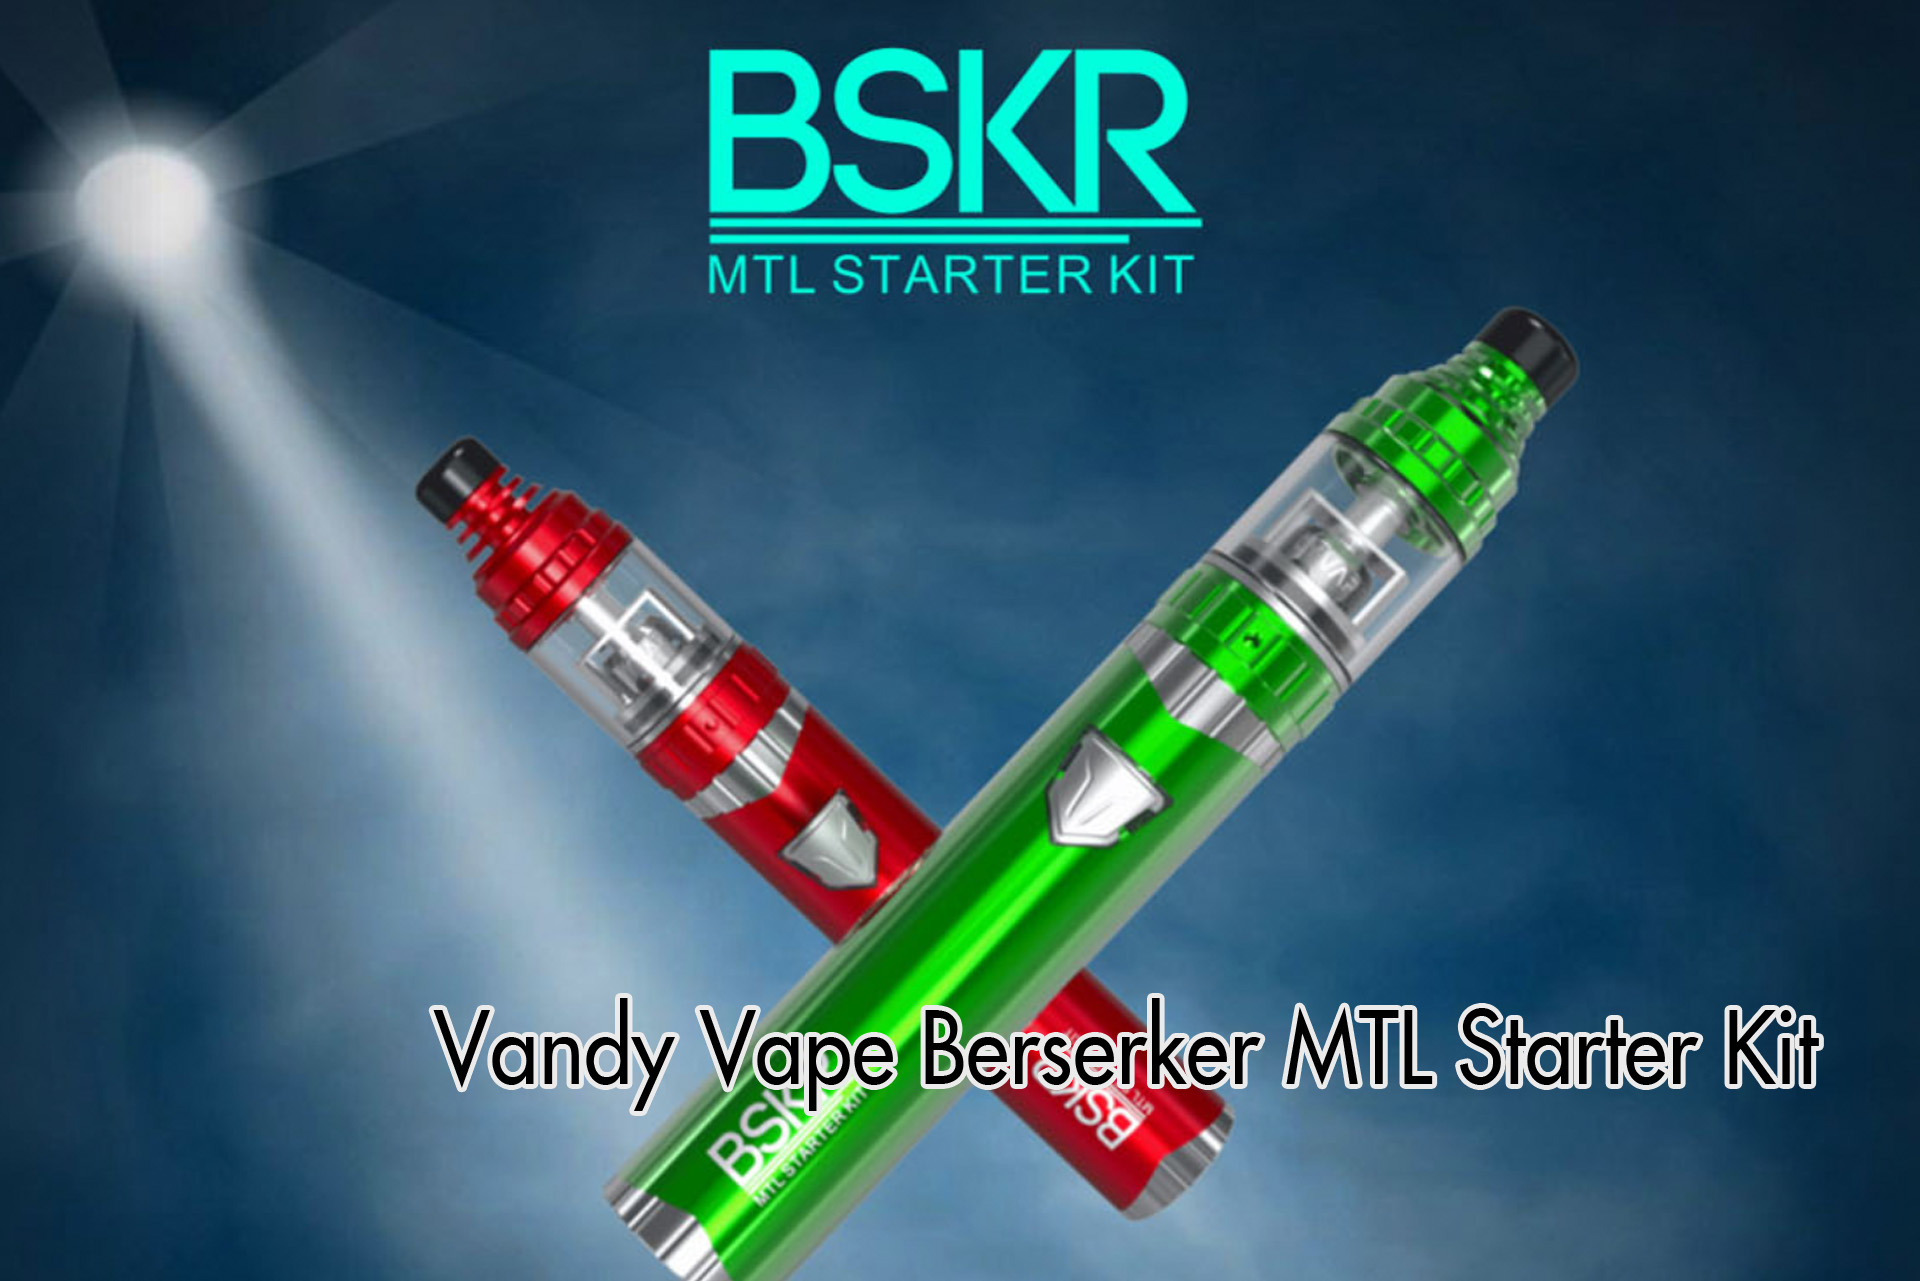 Vandy Vape Berserker MTL Starter Kitメーカー情報まとめ